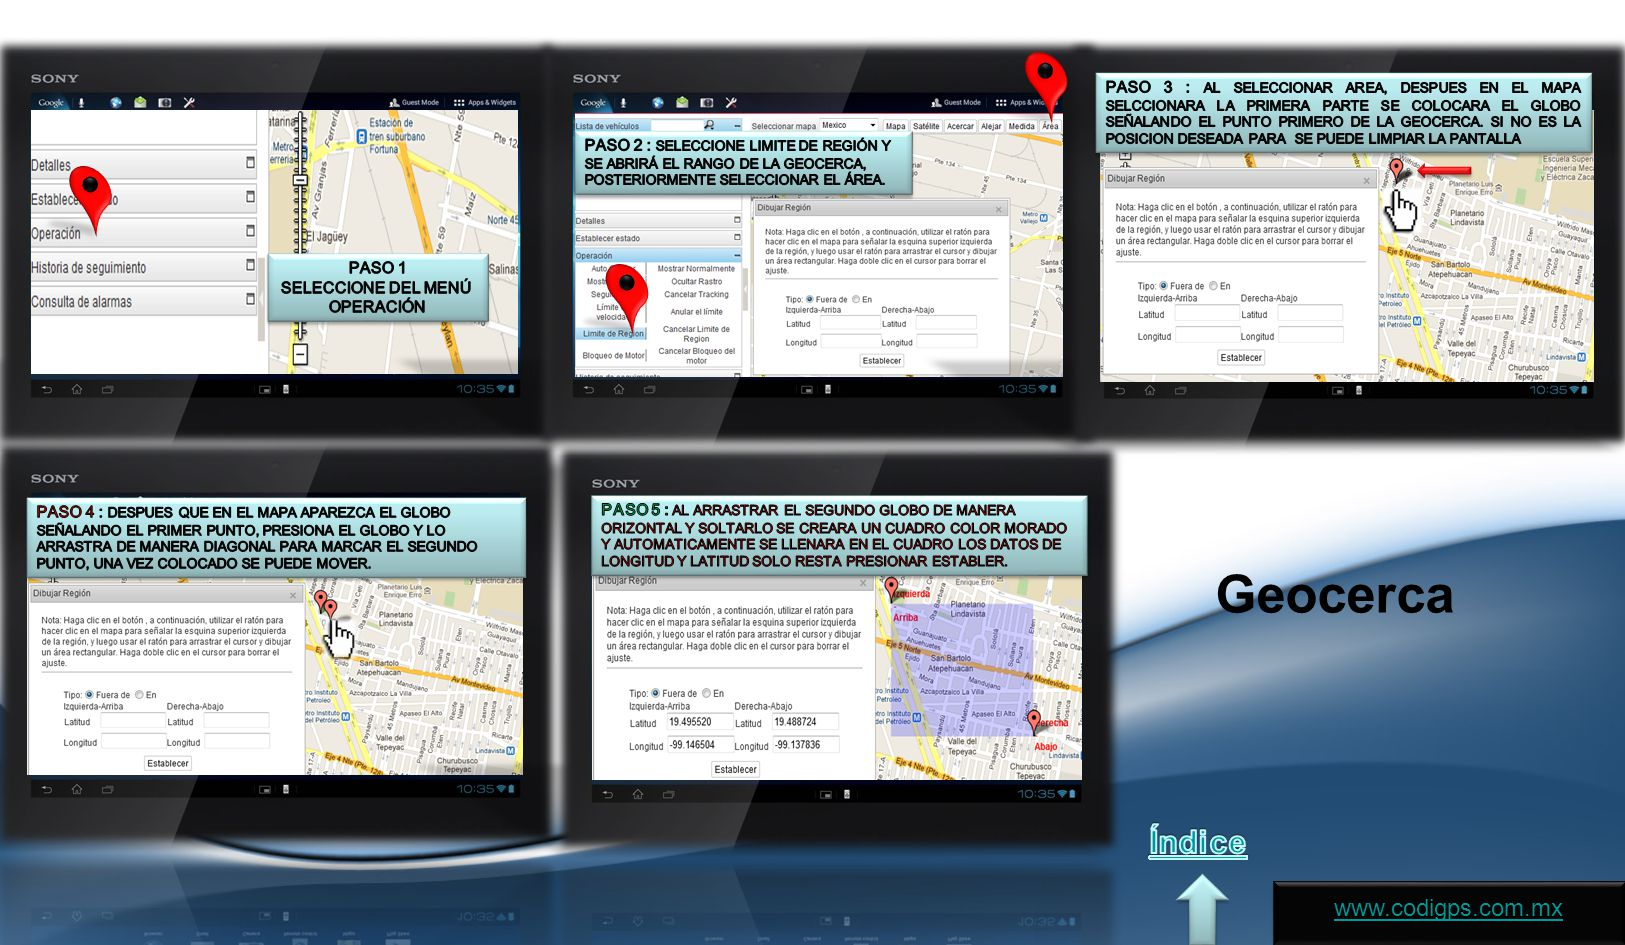 Geocerca Índice www.codigps.com.mx